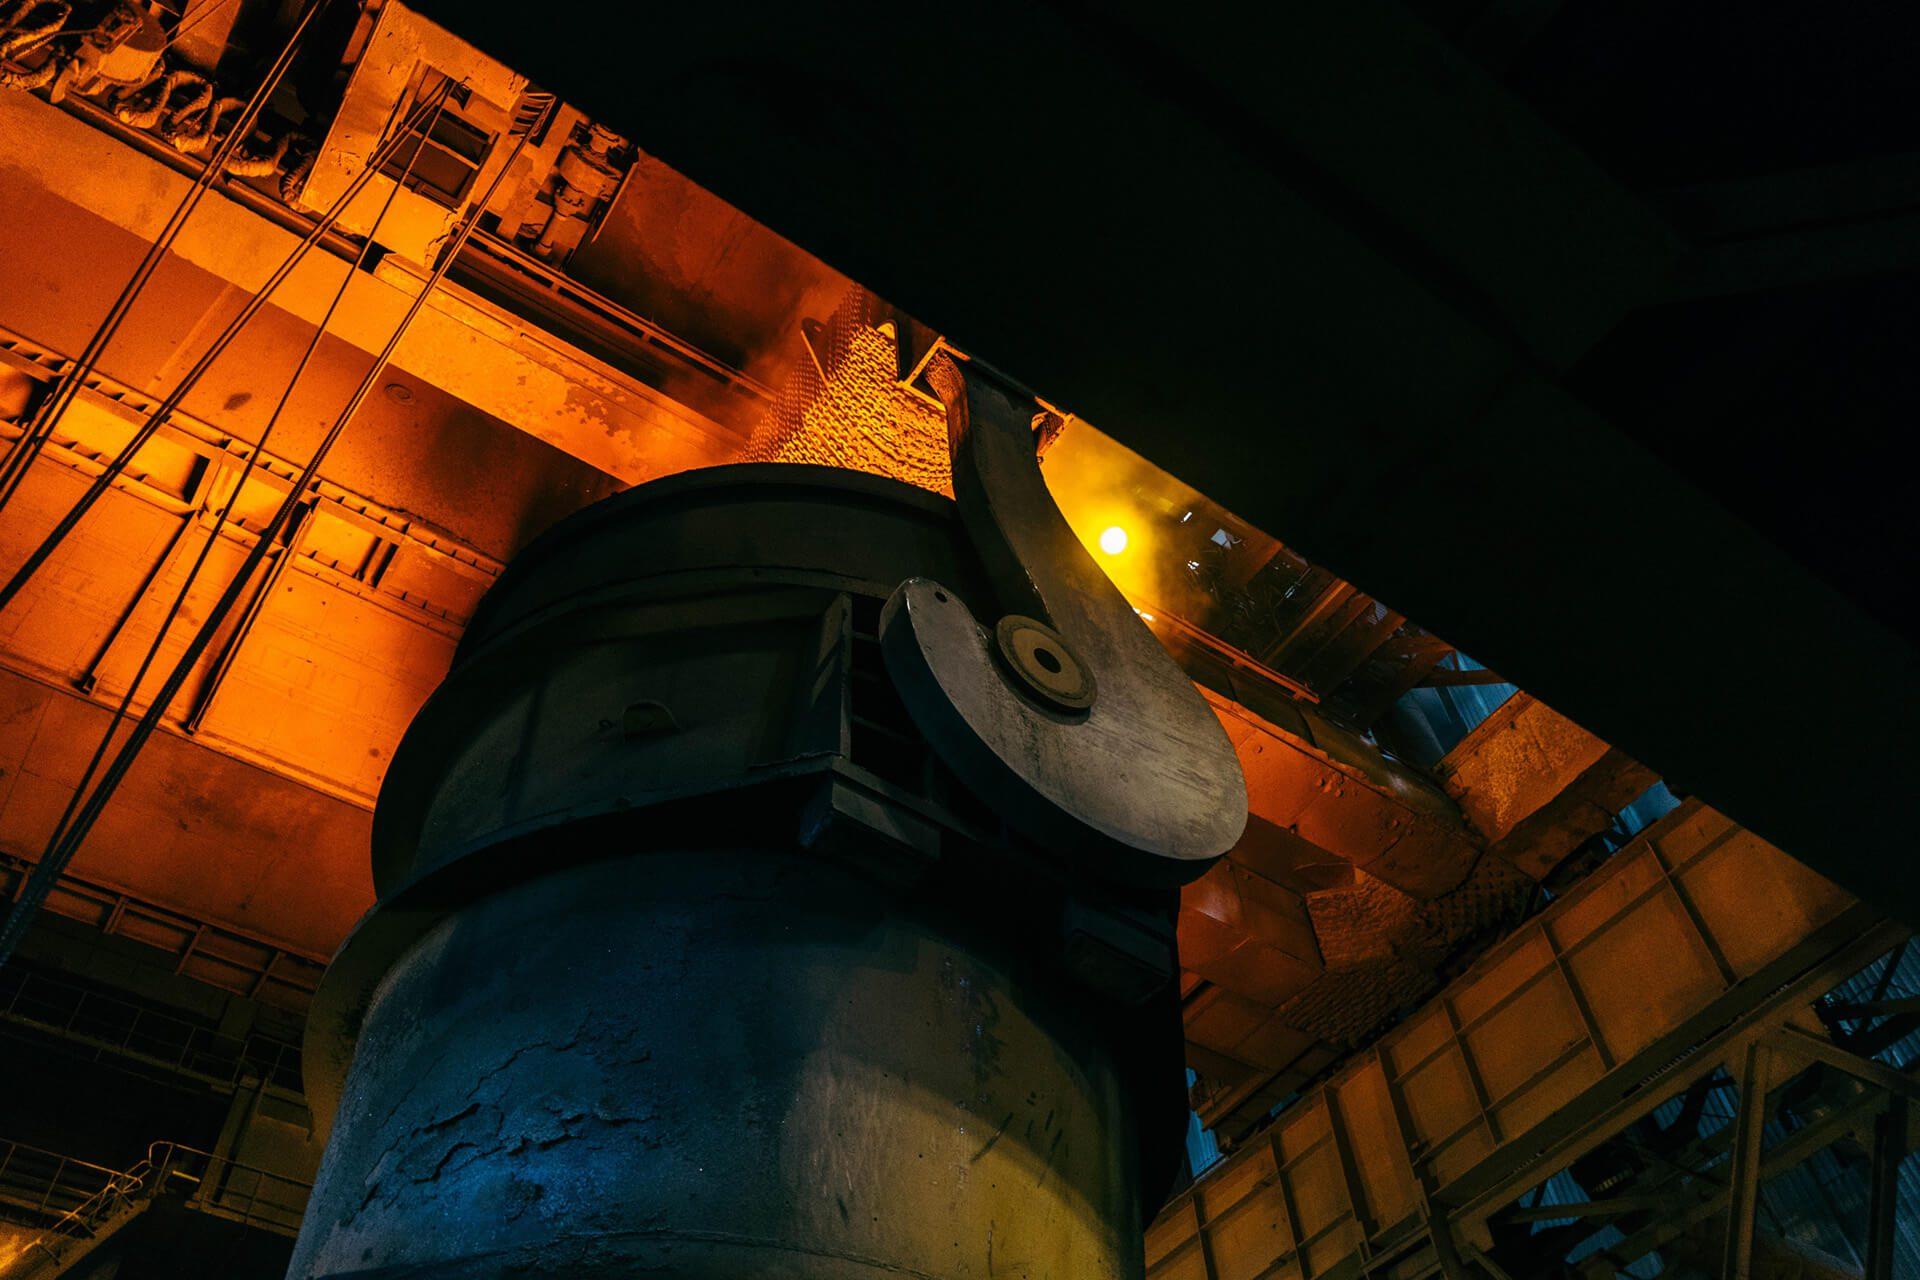 Ladle carrying molten steel in steelmaking plant.